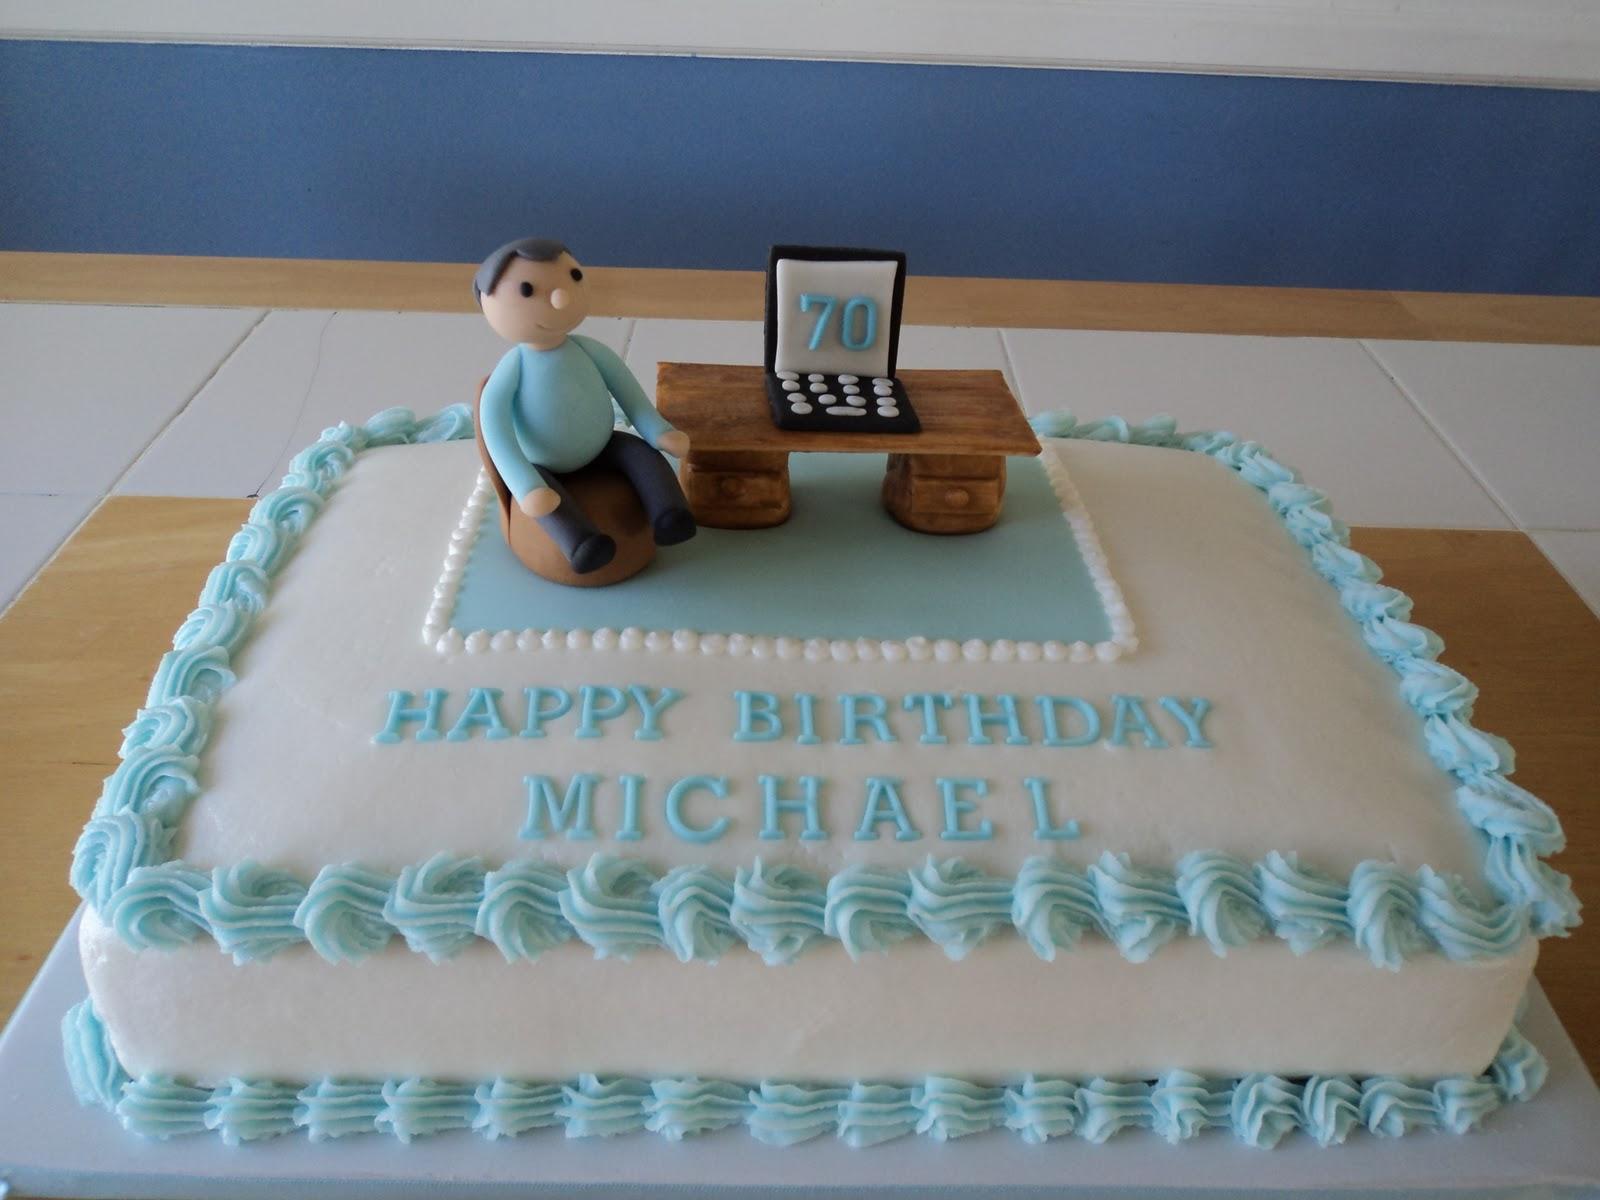 SweetDesigns: 70th Birthday Cake